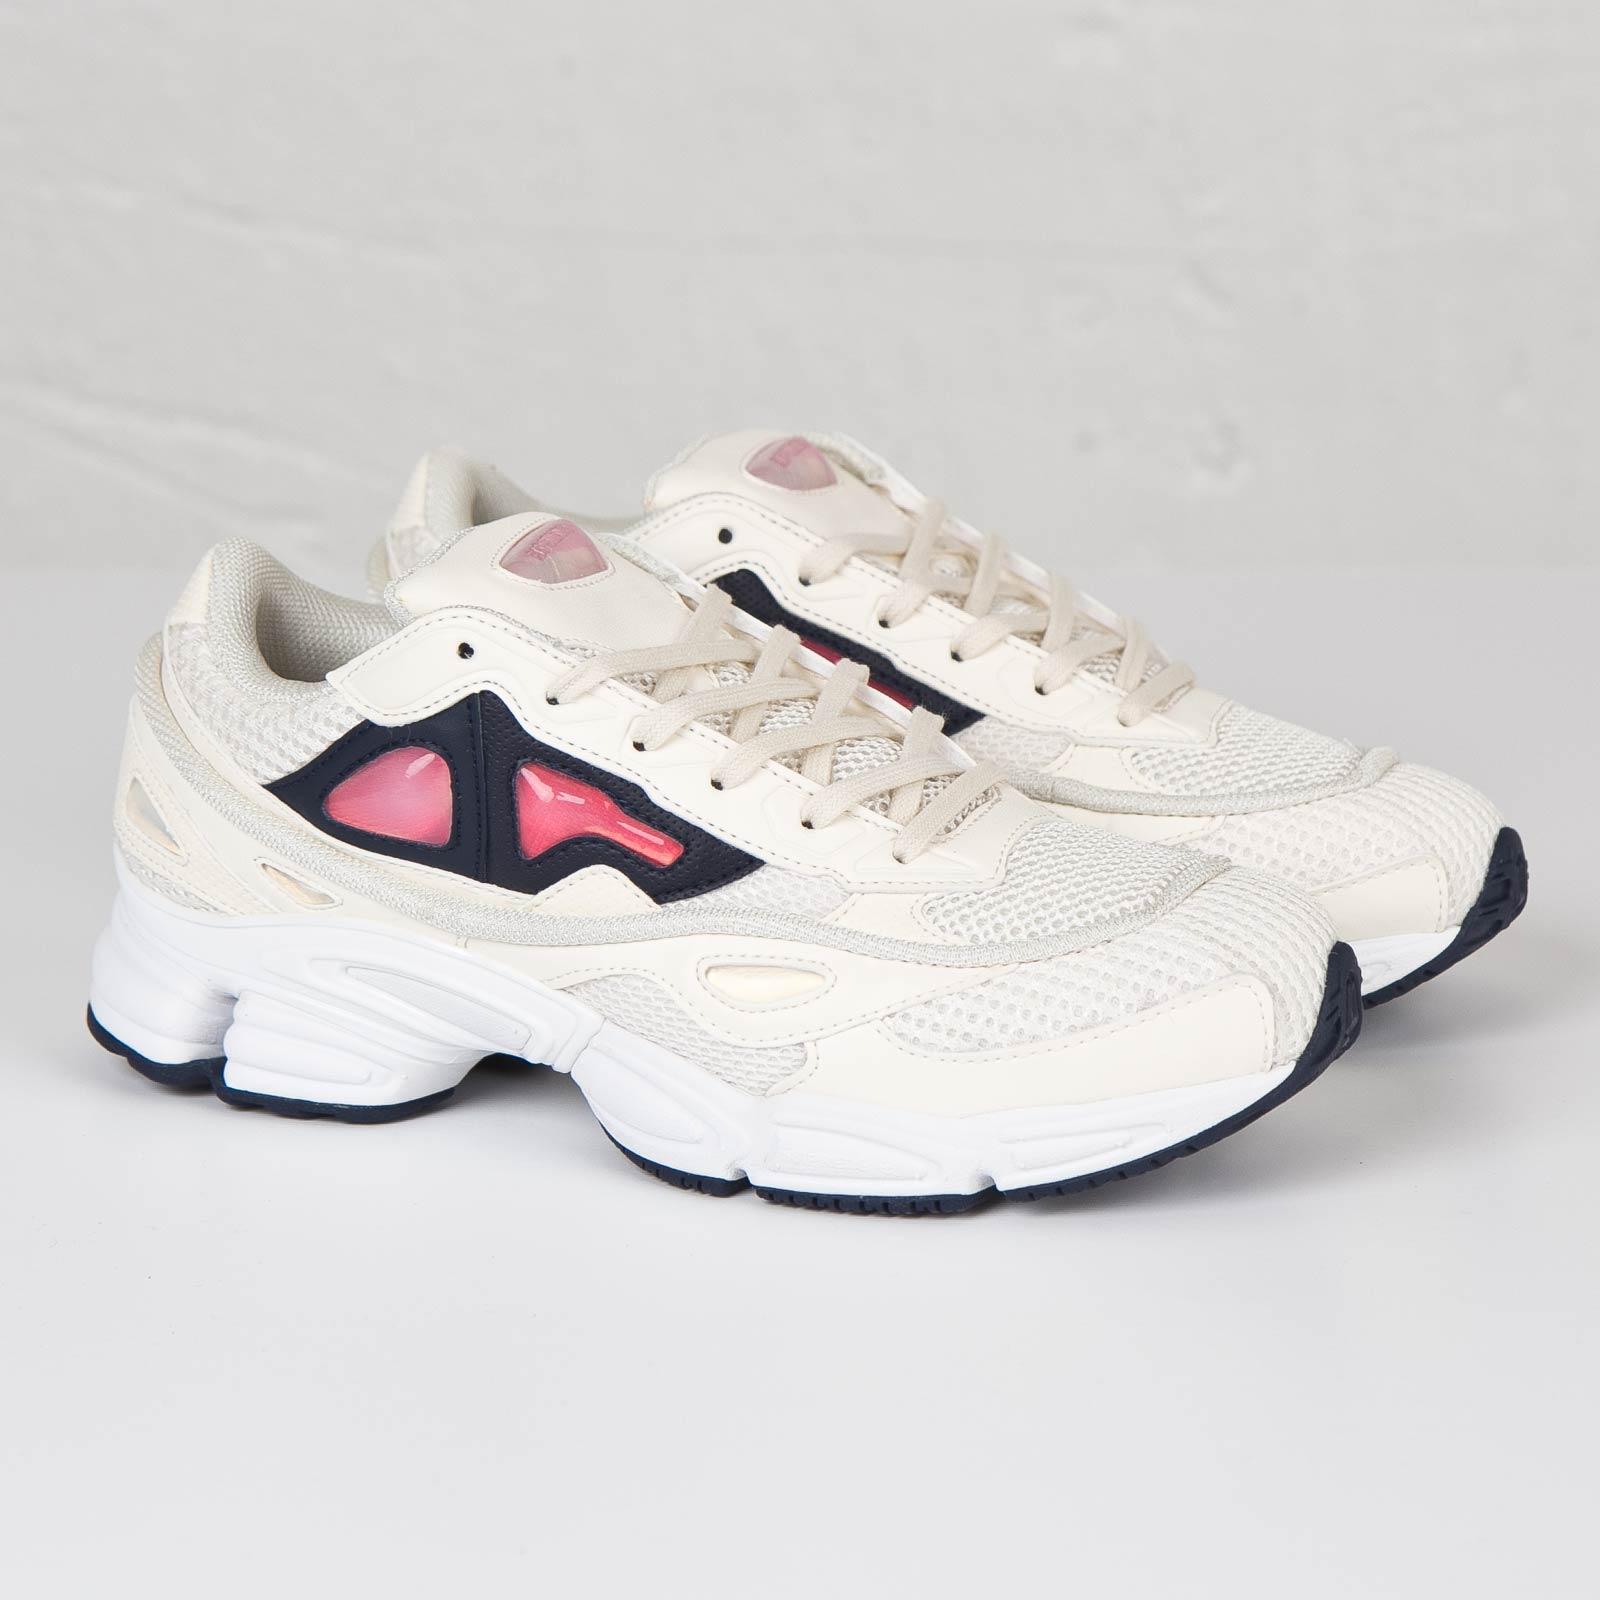 the best attitude 35478 315c0 adidas Raf Simons Ozweego 2 - S74583 - Sneakersnstuff ...